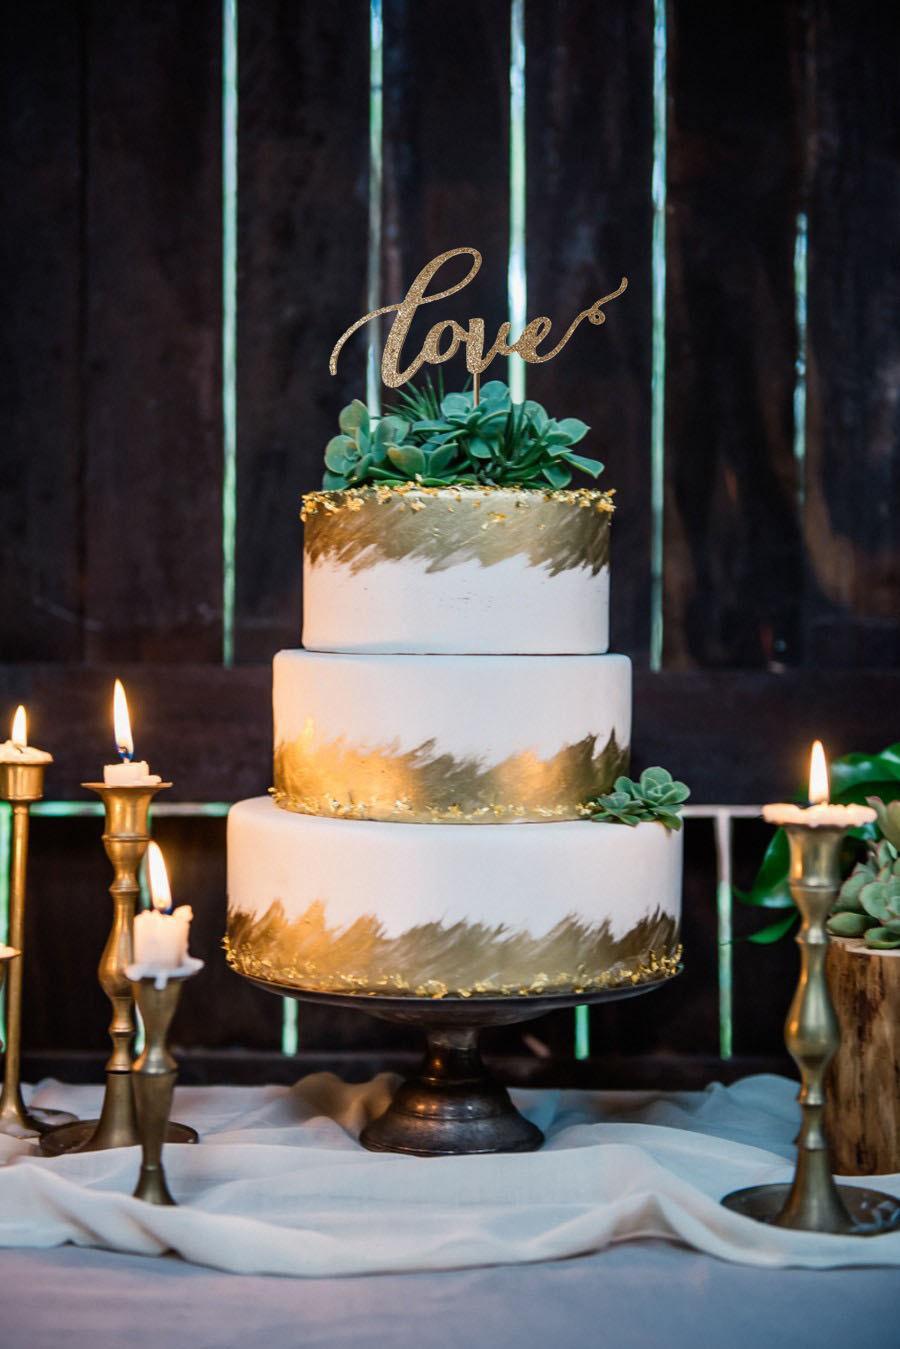 Love Wedding Cake Topper, Cake Topper, Rustic Cake Topper, Wedding ...